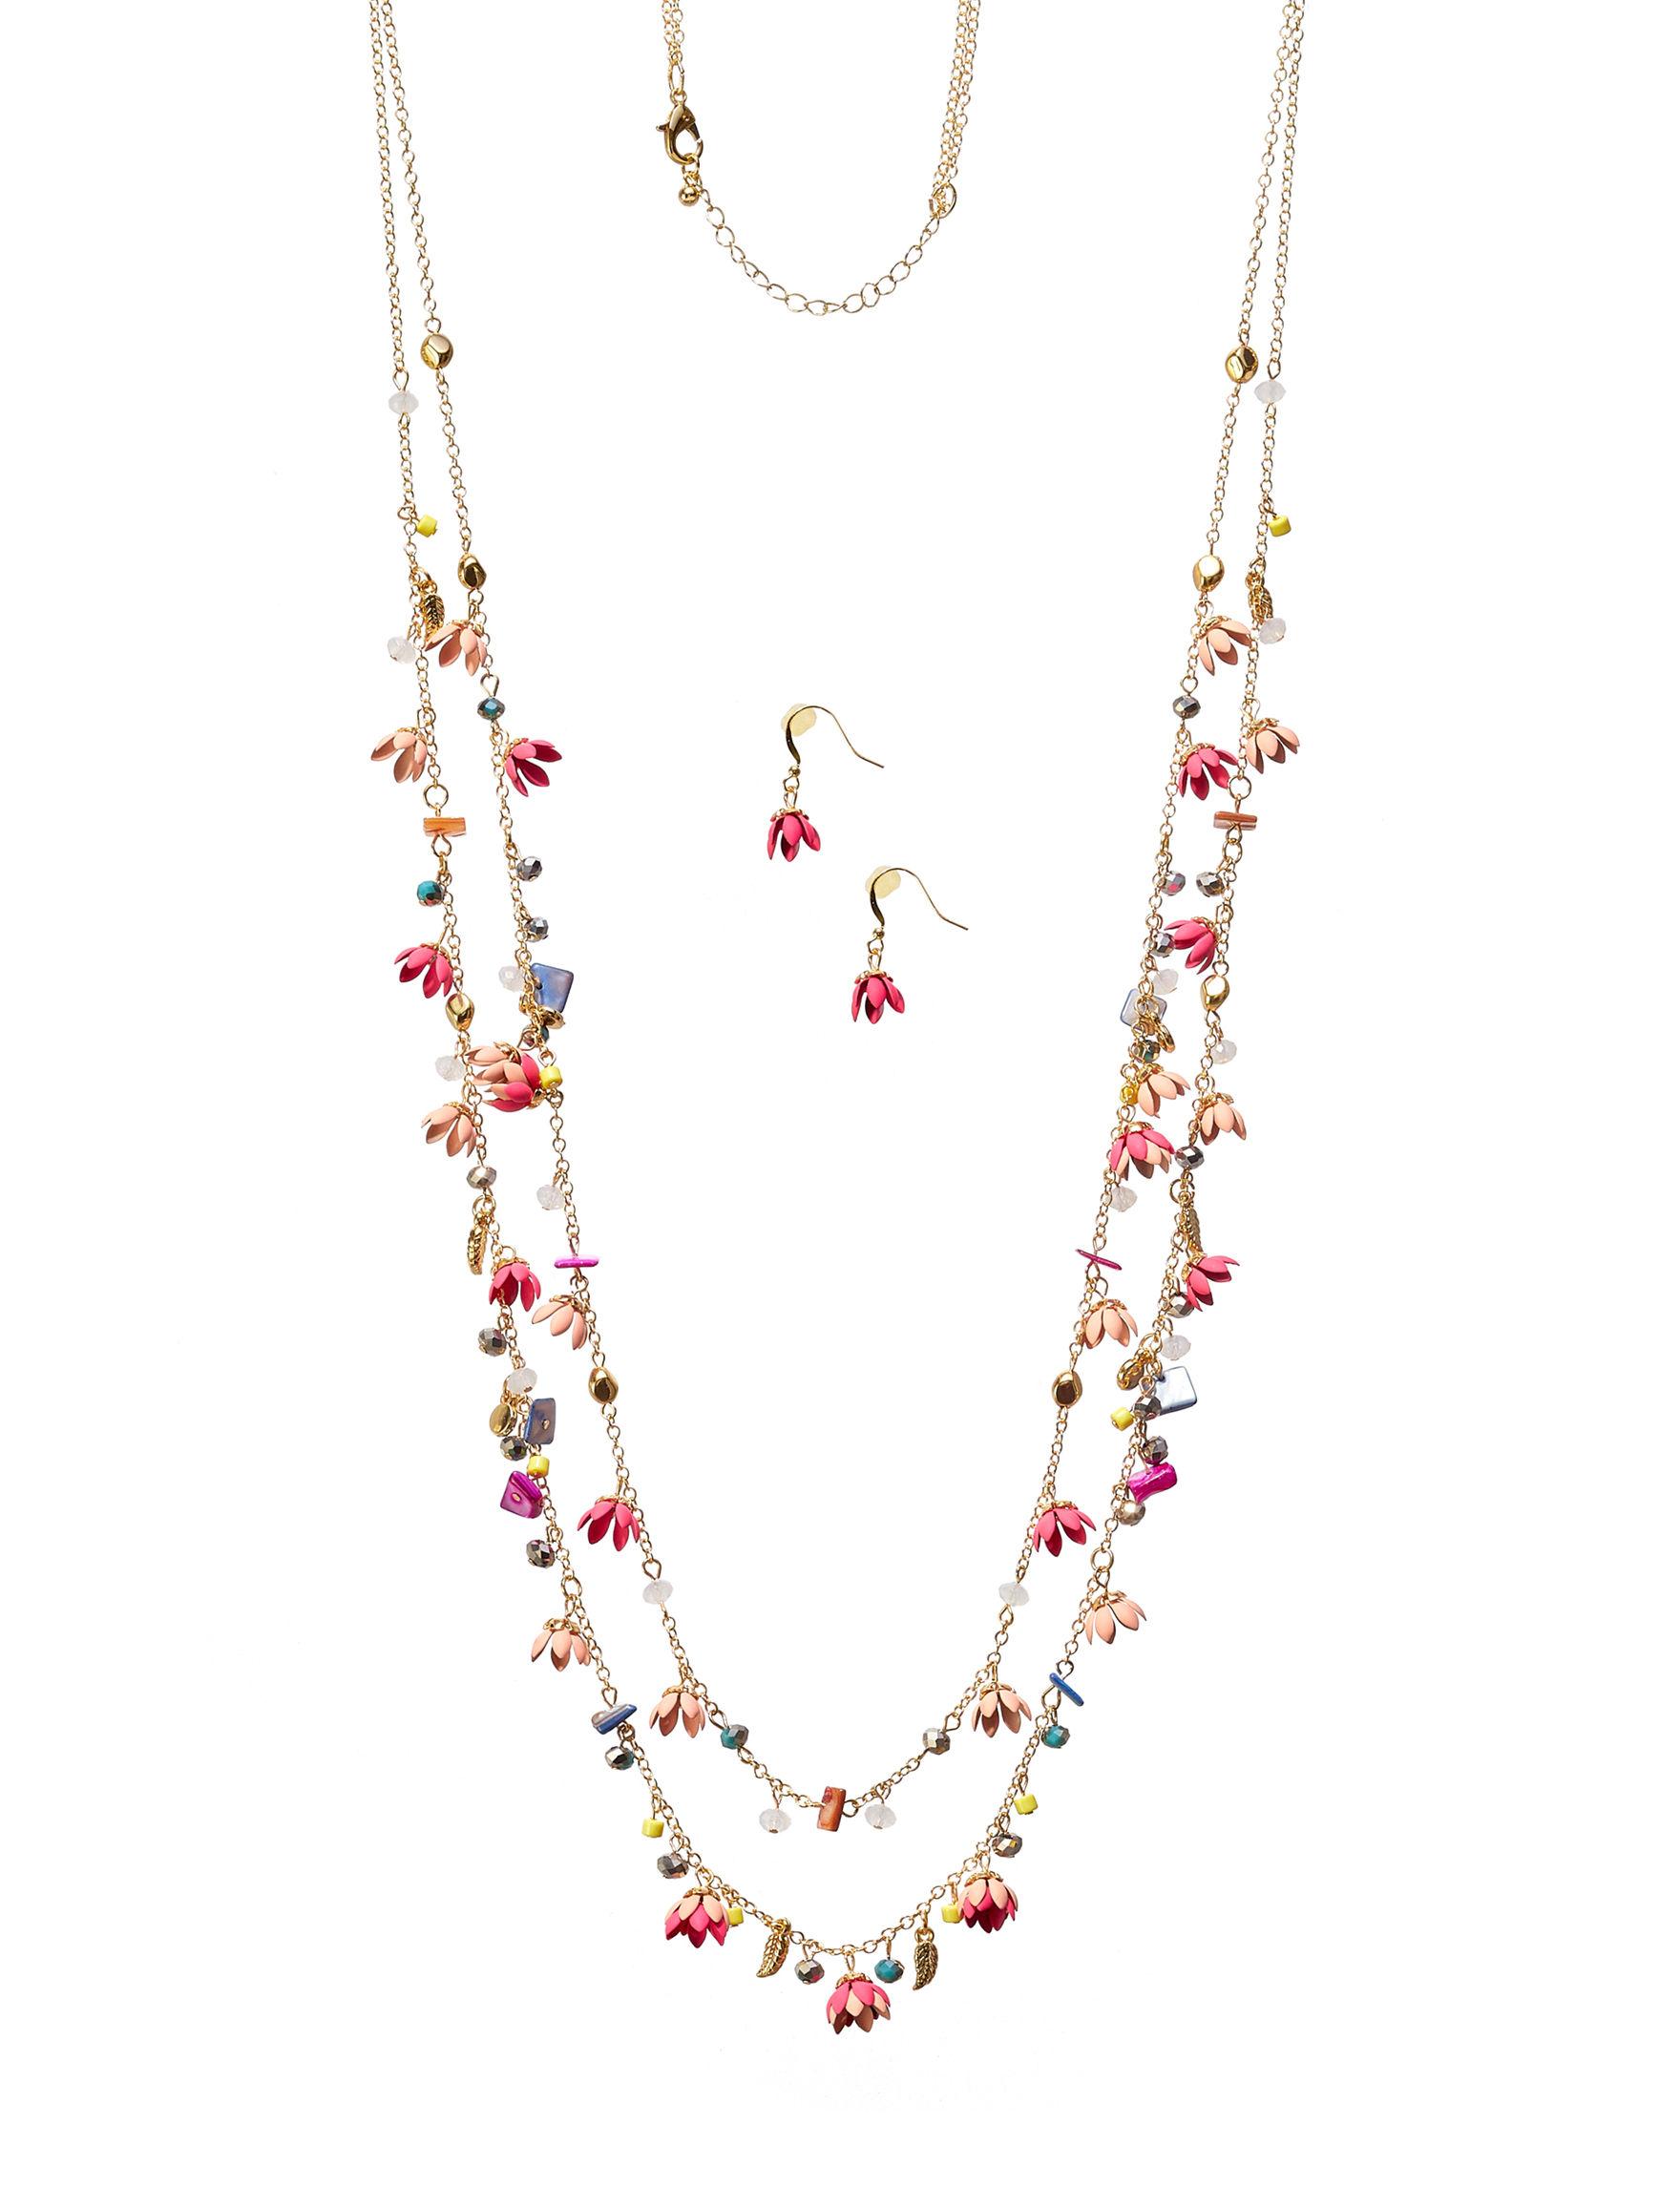 Hannah Gold / Multi Drops Earrings Necklaces & Pendants Fashion Jewelry